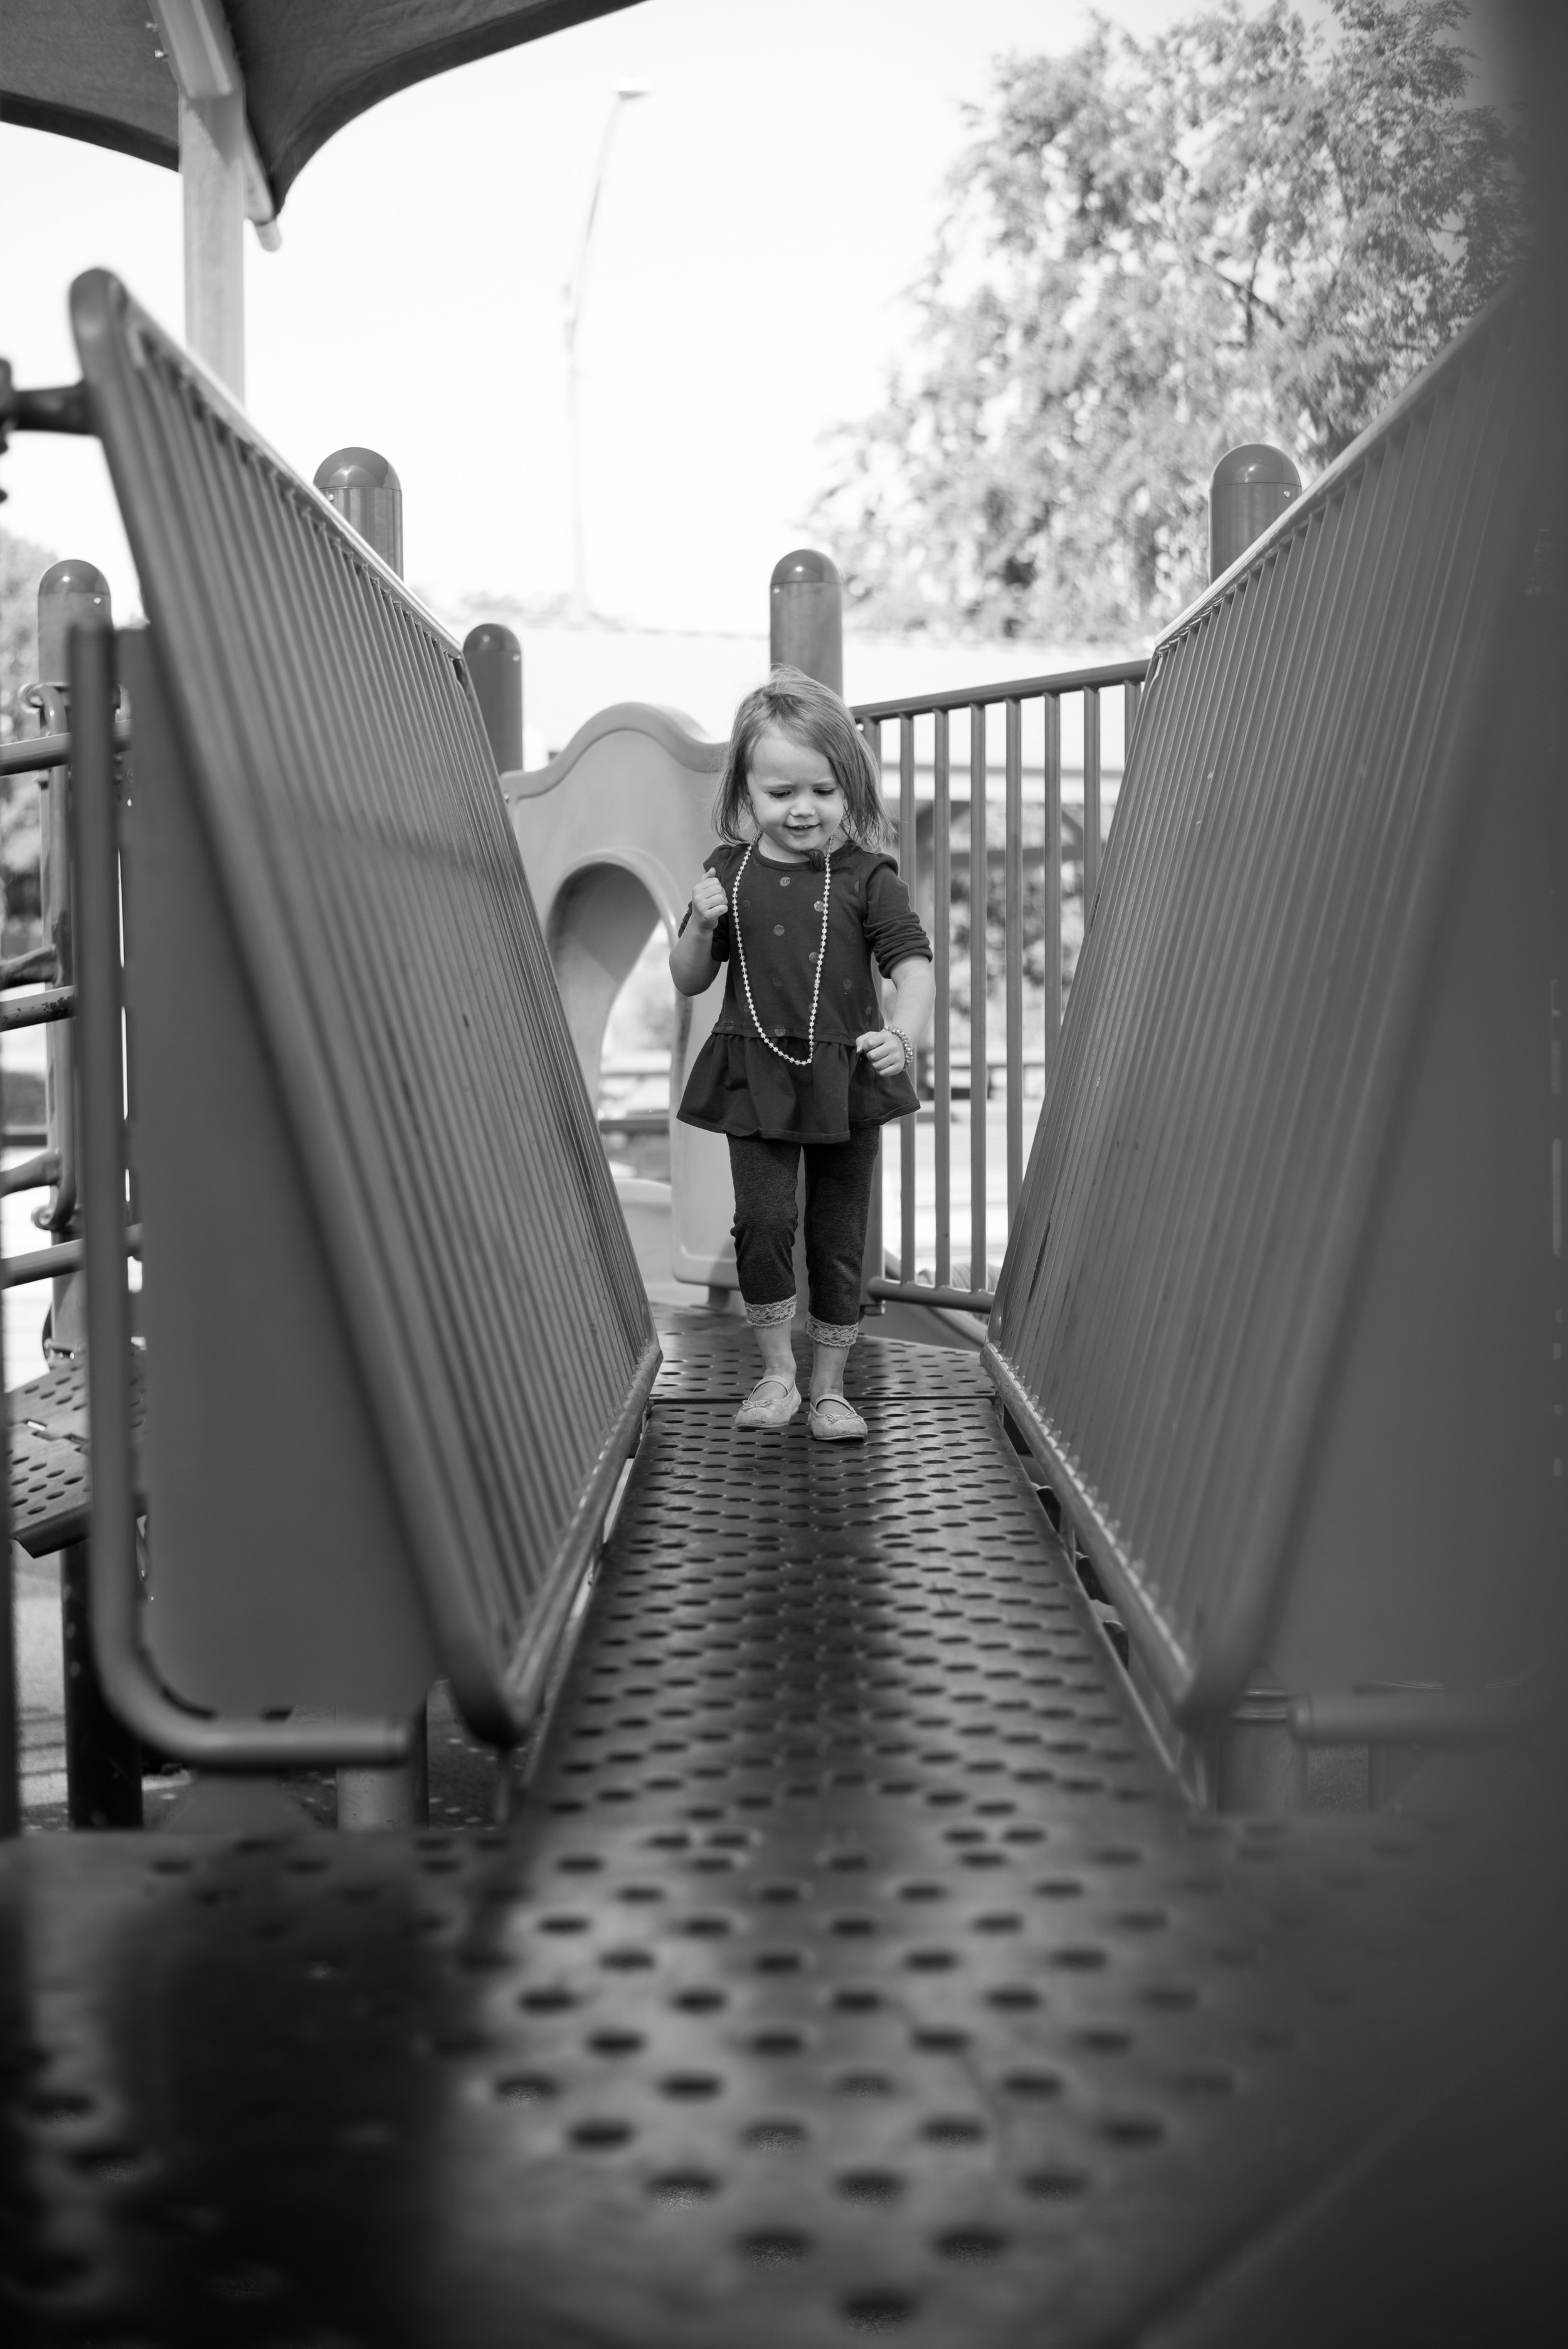 determined, brave, playground fun